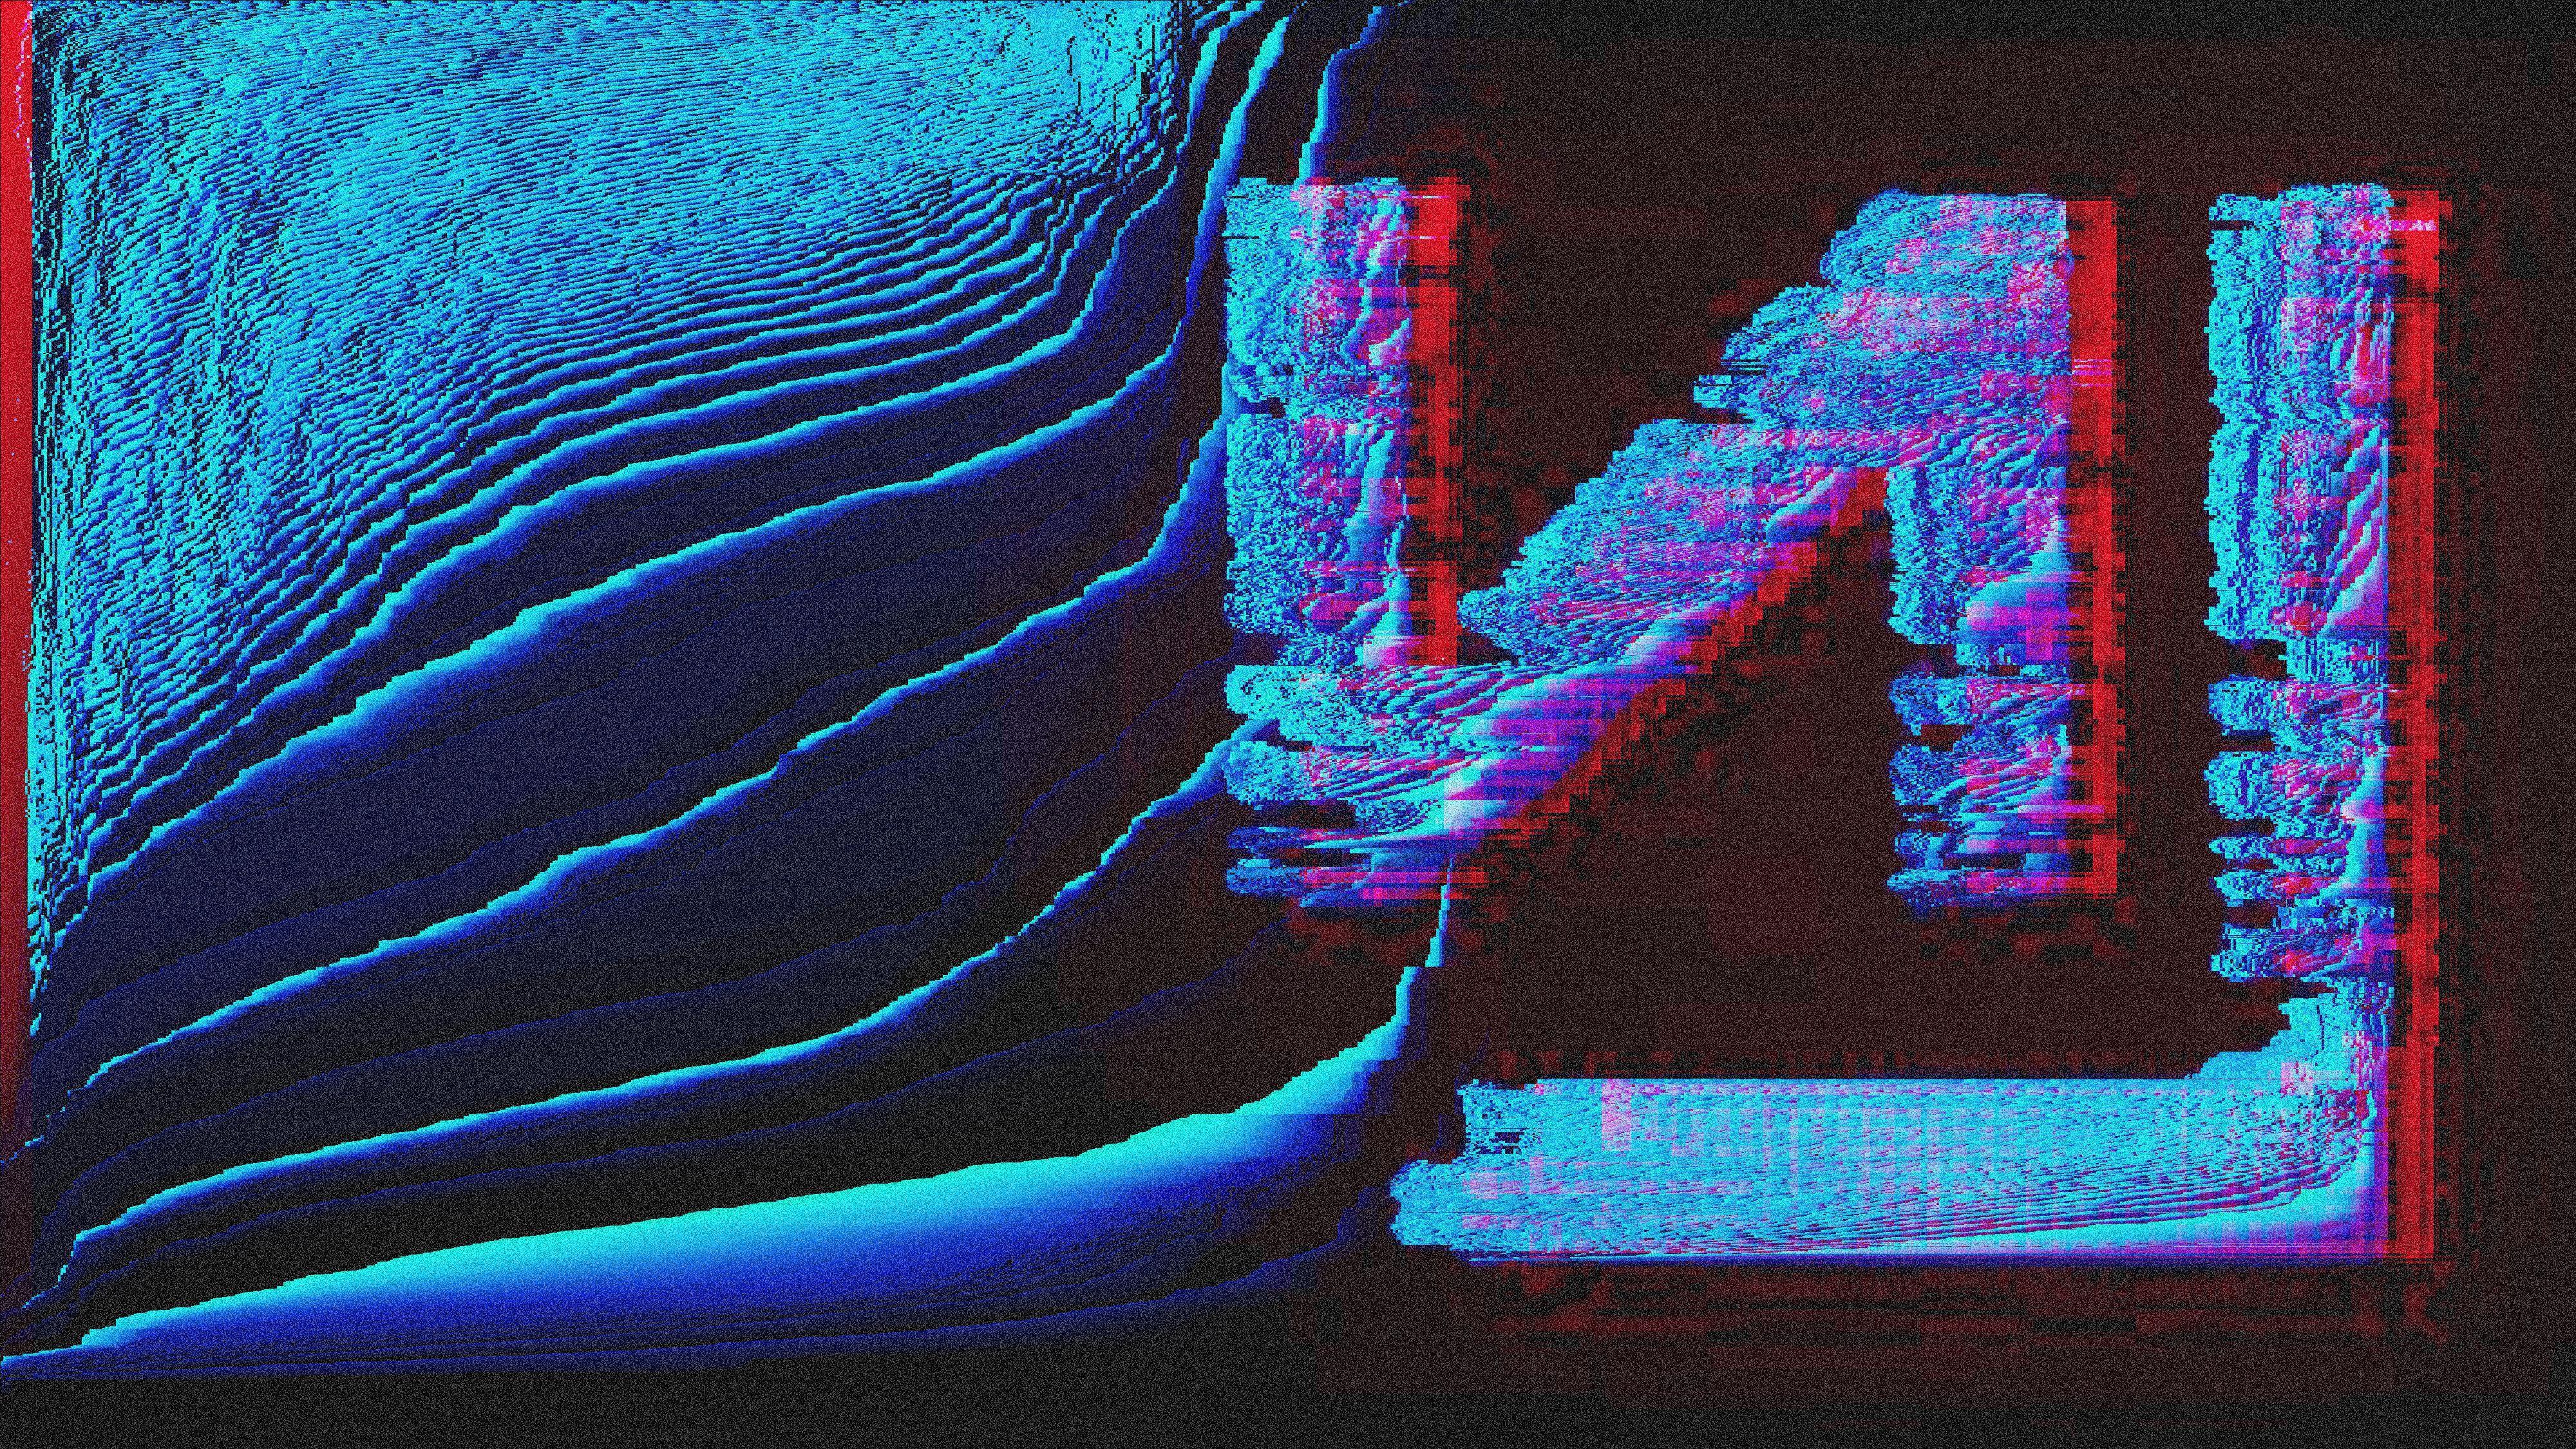 Banner I designed for the Nine Inch Nails Discord server